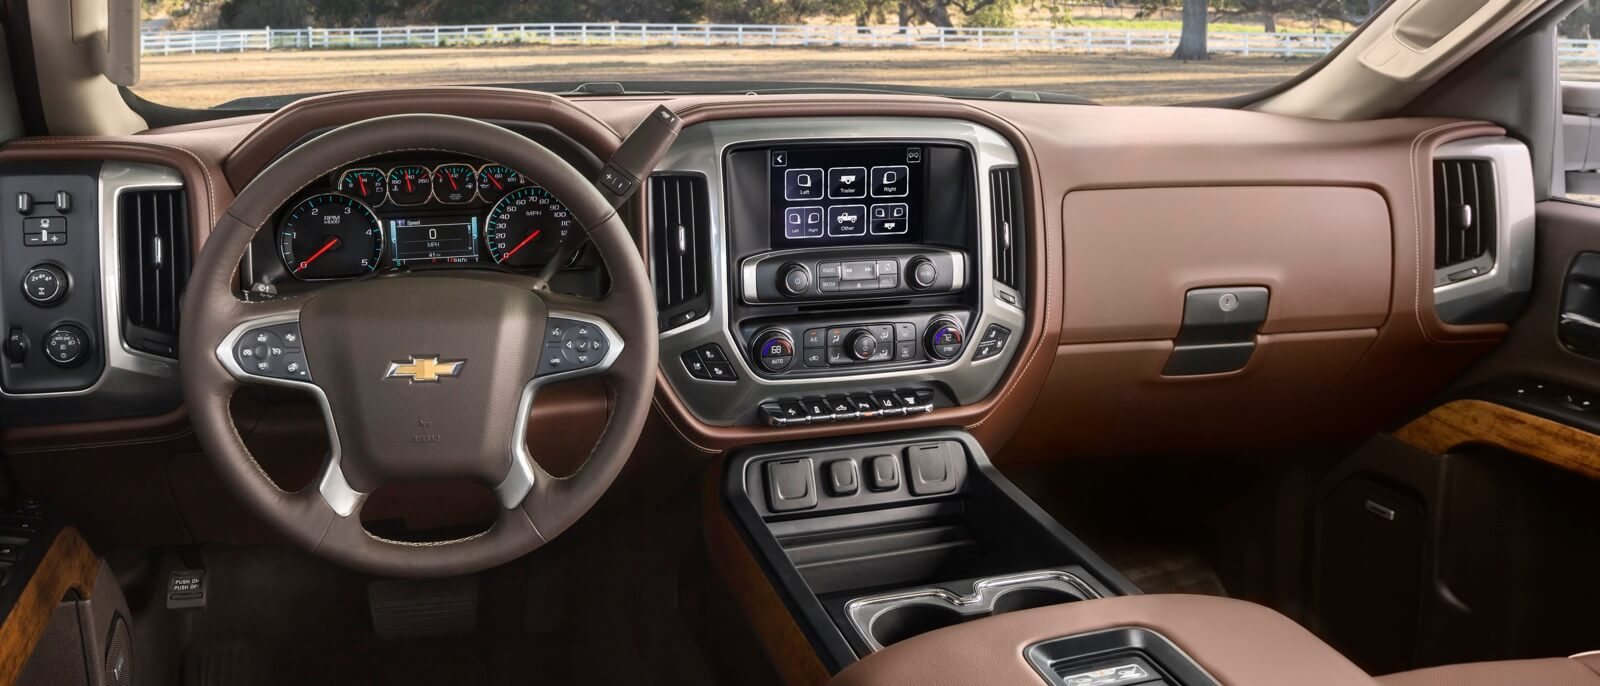 2017 Chevrolet Silverado 2500 Hd Pickup Truck